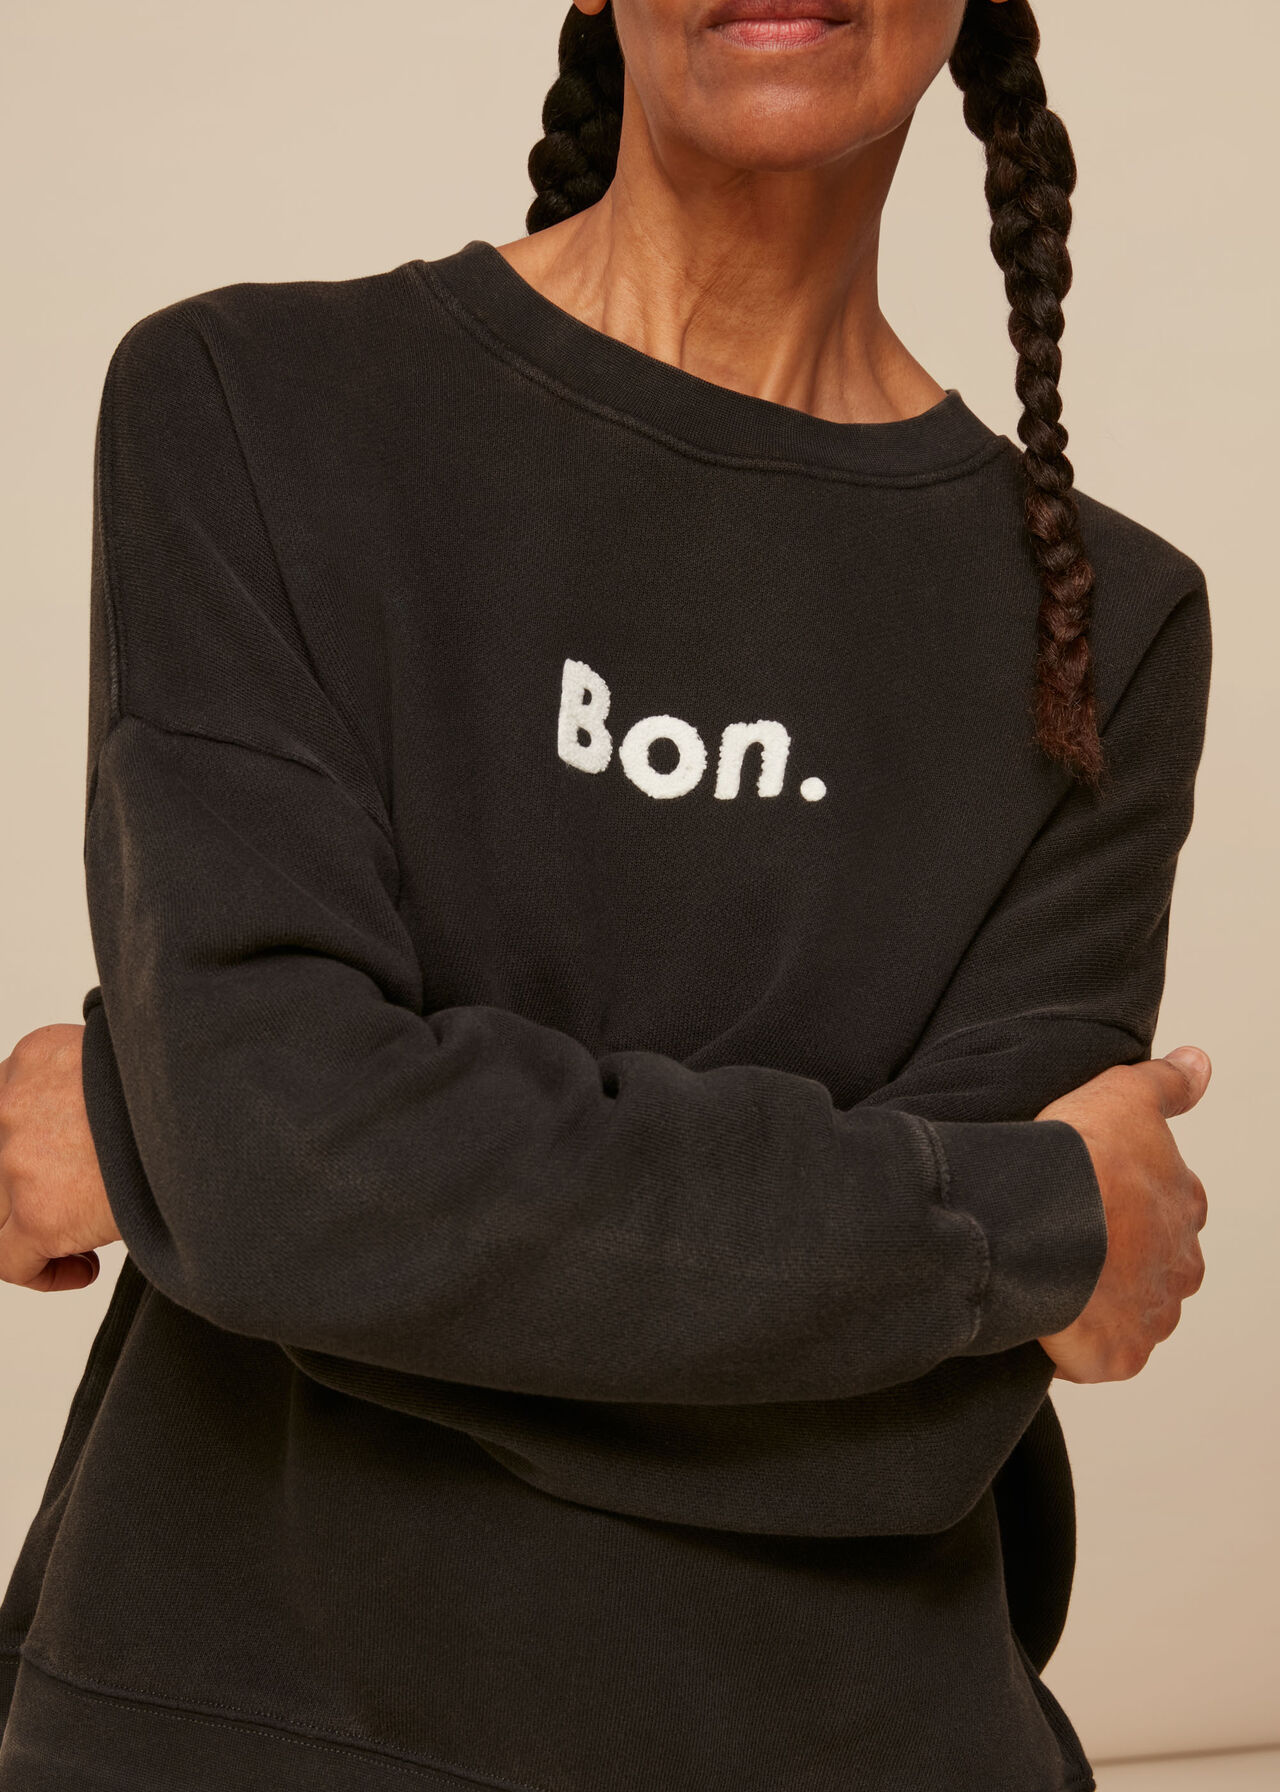 Bon Sweater